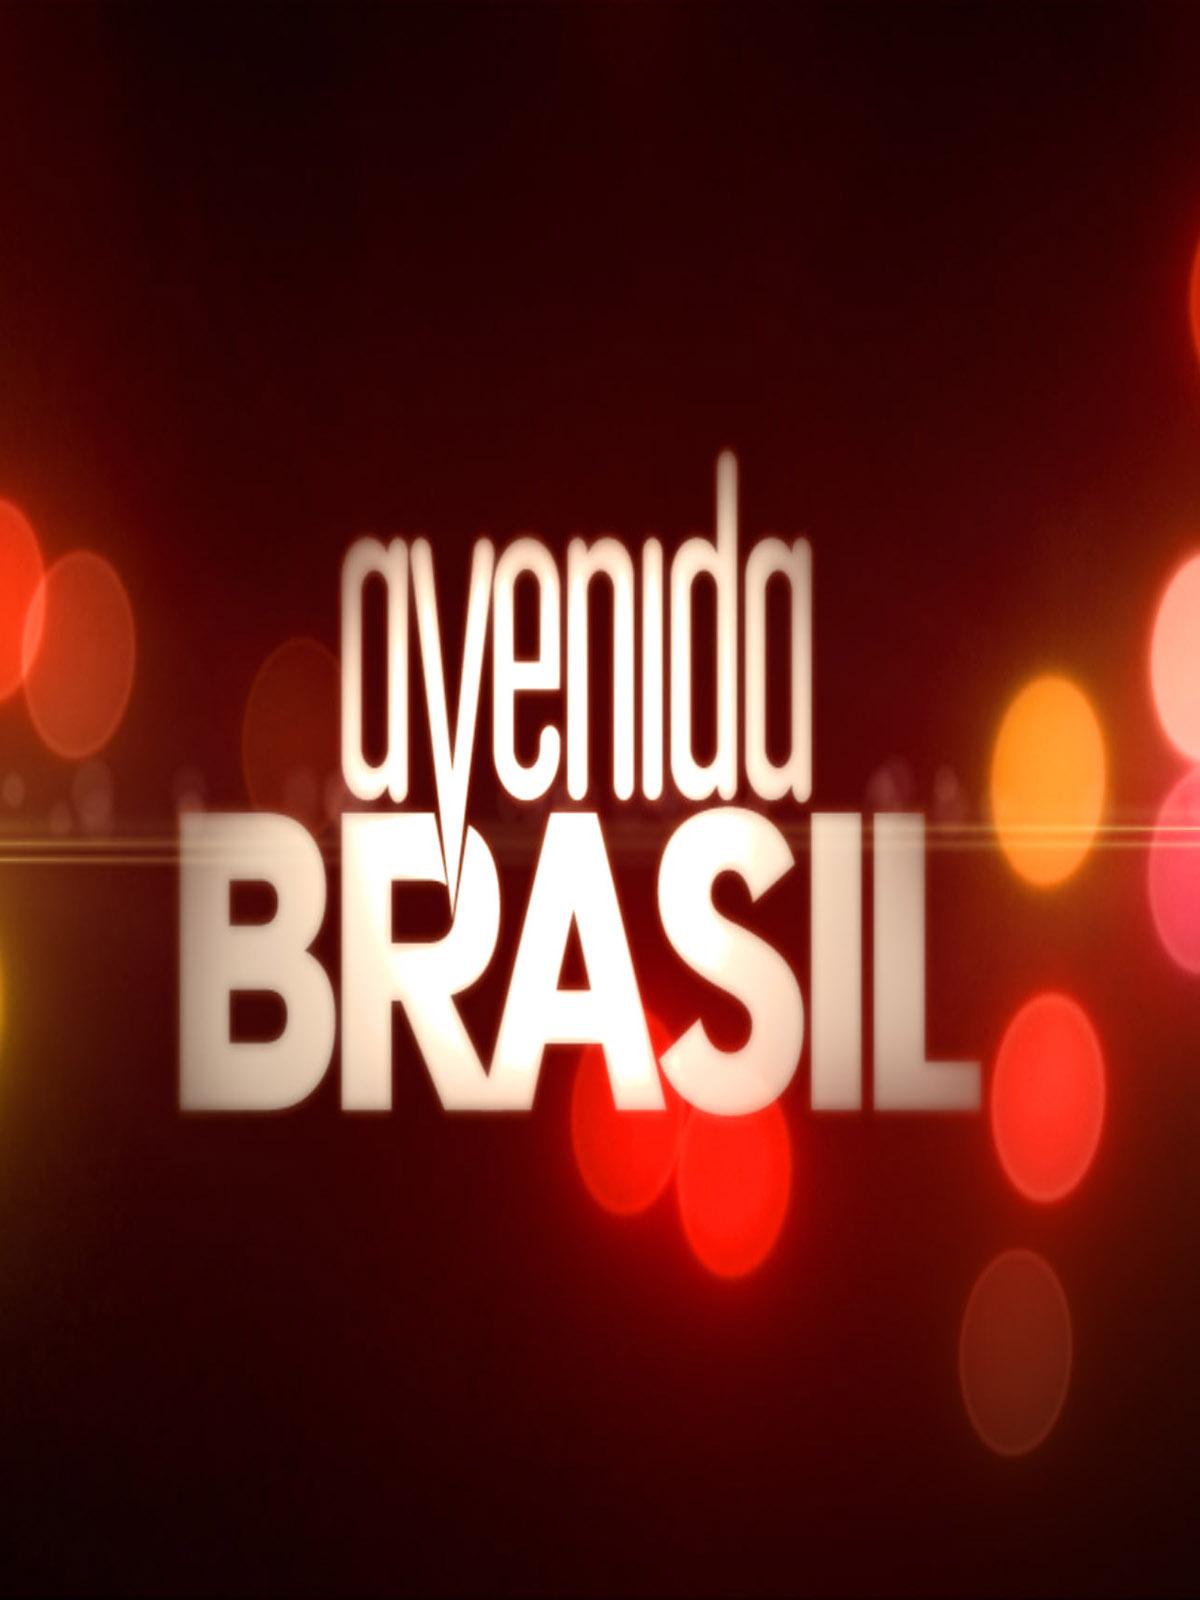 Affiche de la série Avenida Brasil